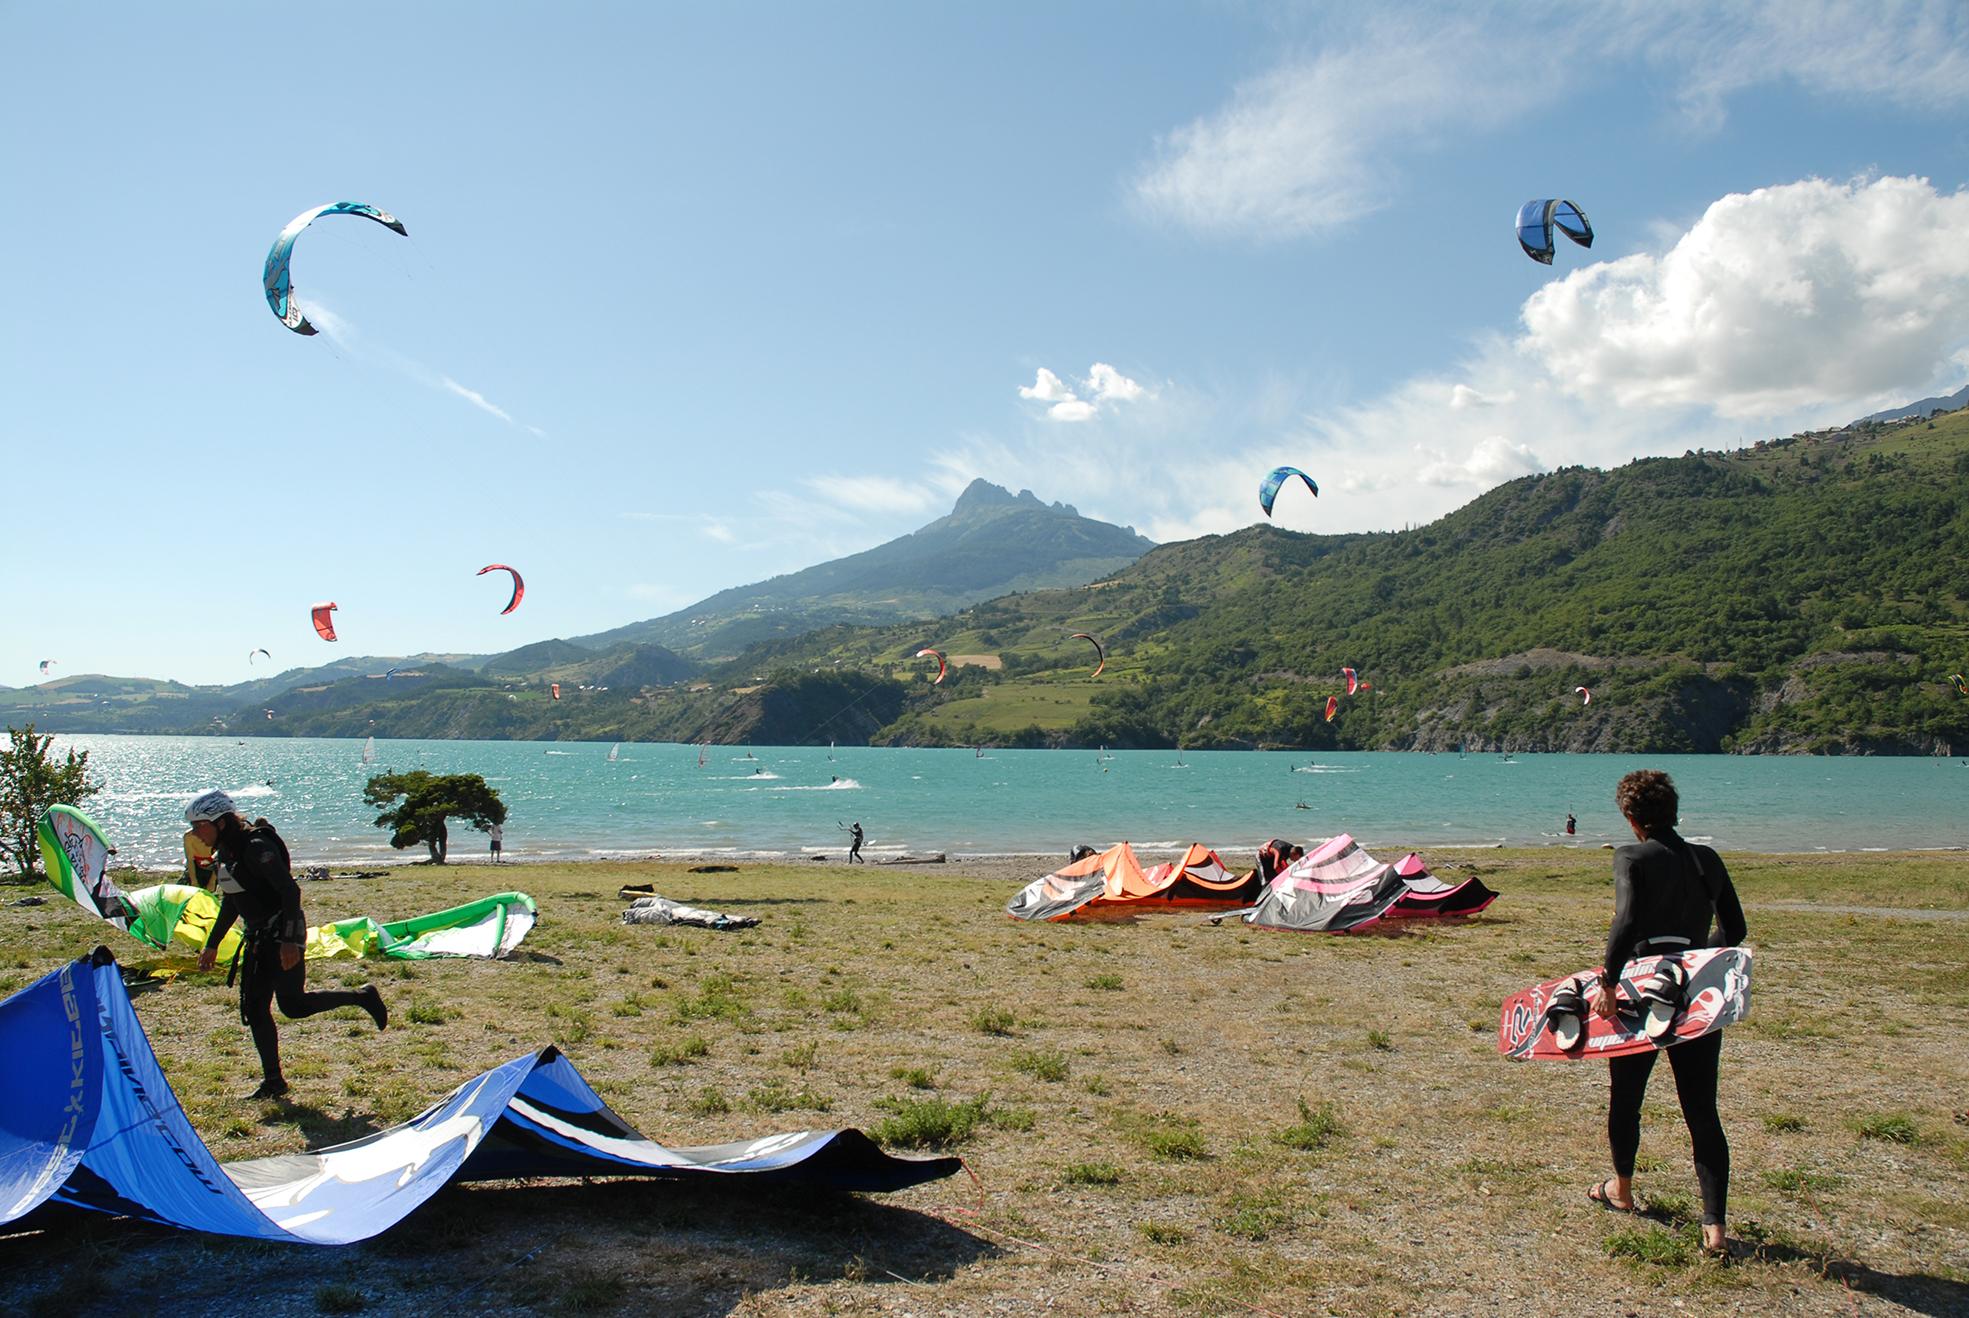 SERRE-PONÇON_kite-surf-lac-Serre-Ponçon@Pennarun